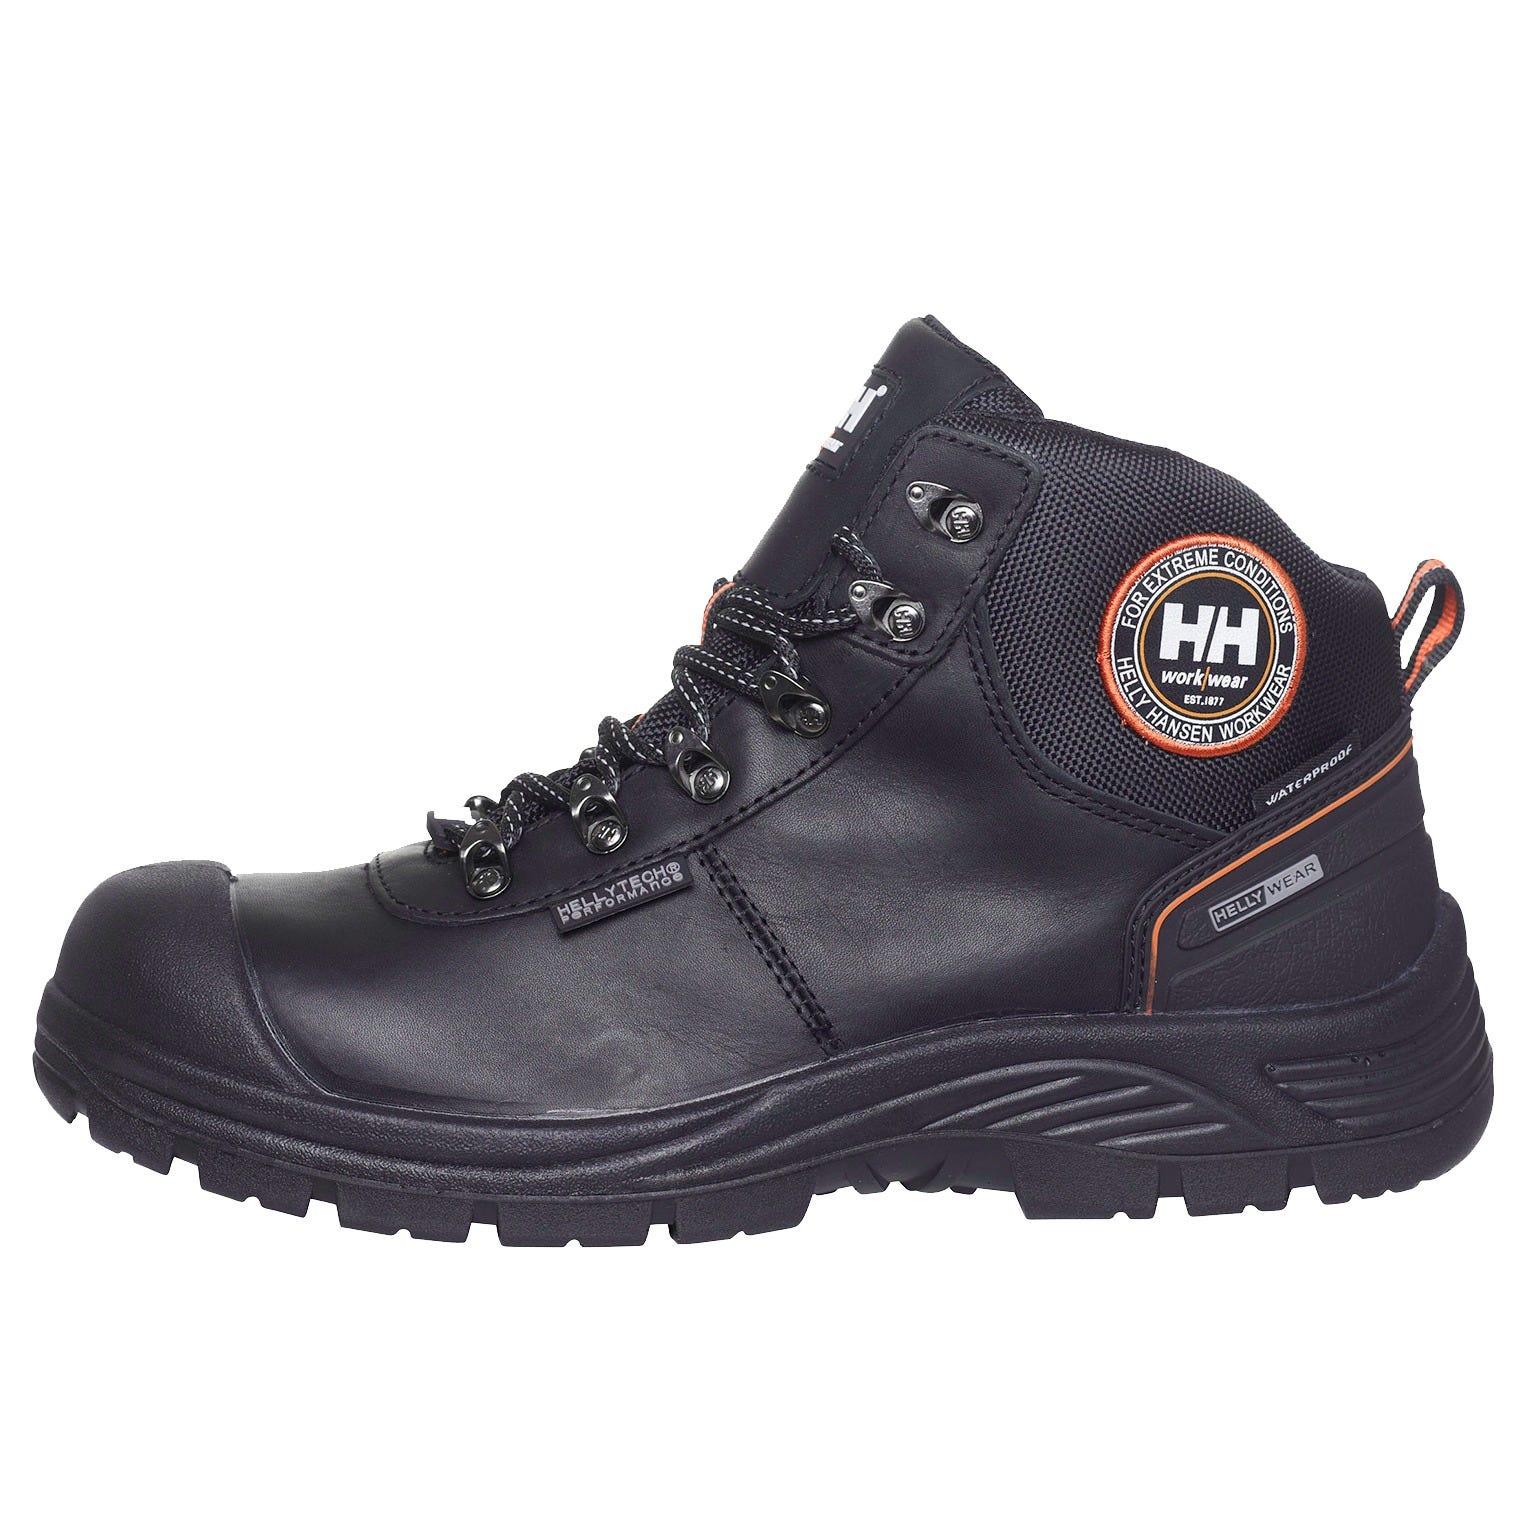 HH Workwear Workwear Helly Hansen Scarpa Mid Antinfortunistica Chelsea Certificata S3 Impermeabile Con Punta In Materiale Composito 43 Nero